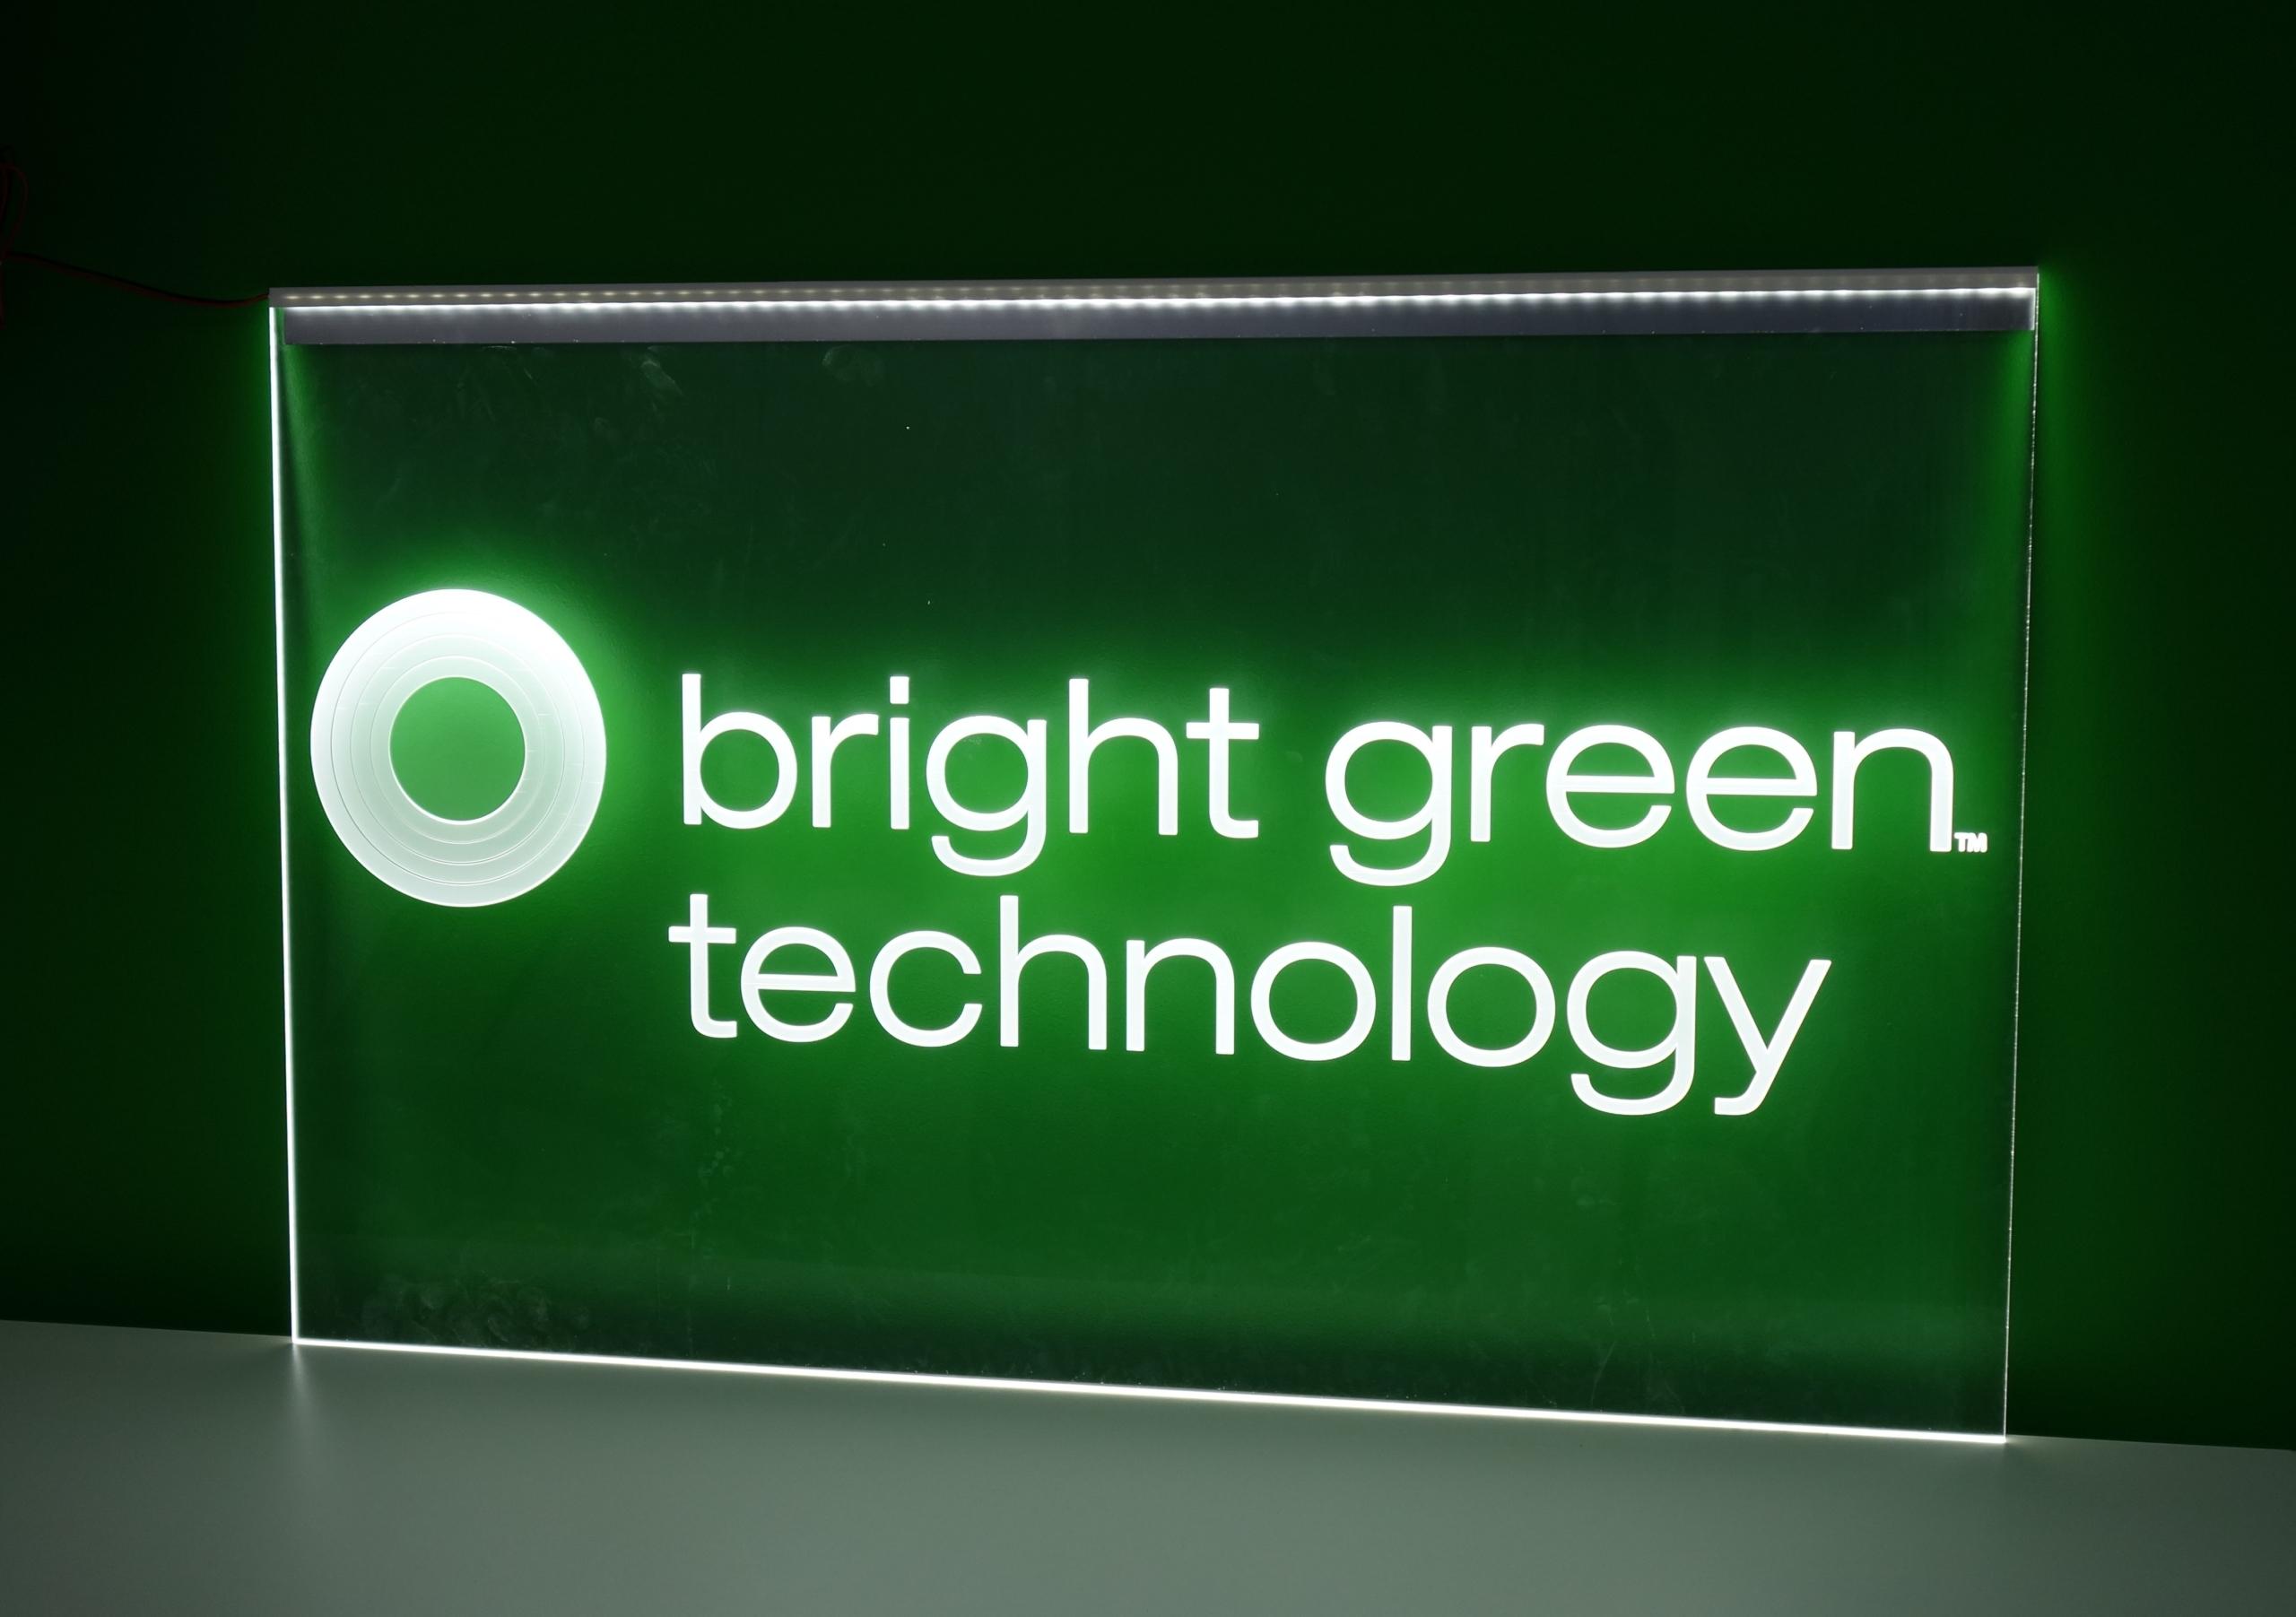 Branded LED illuminated screen